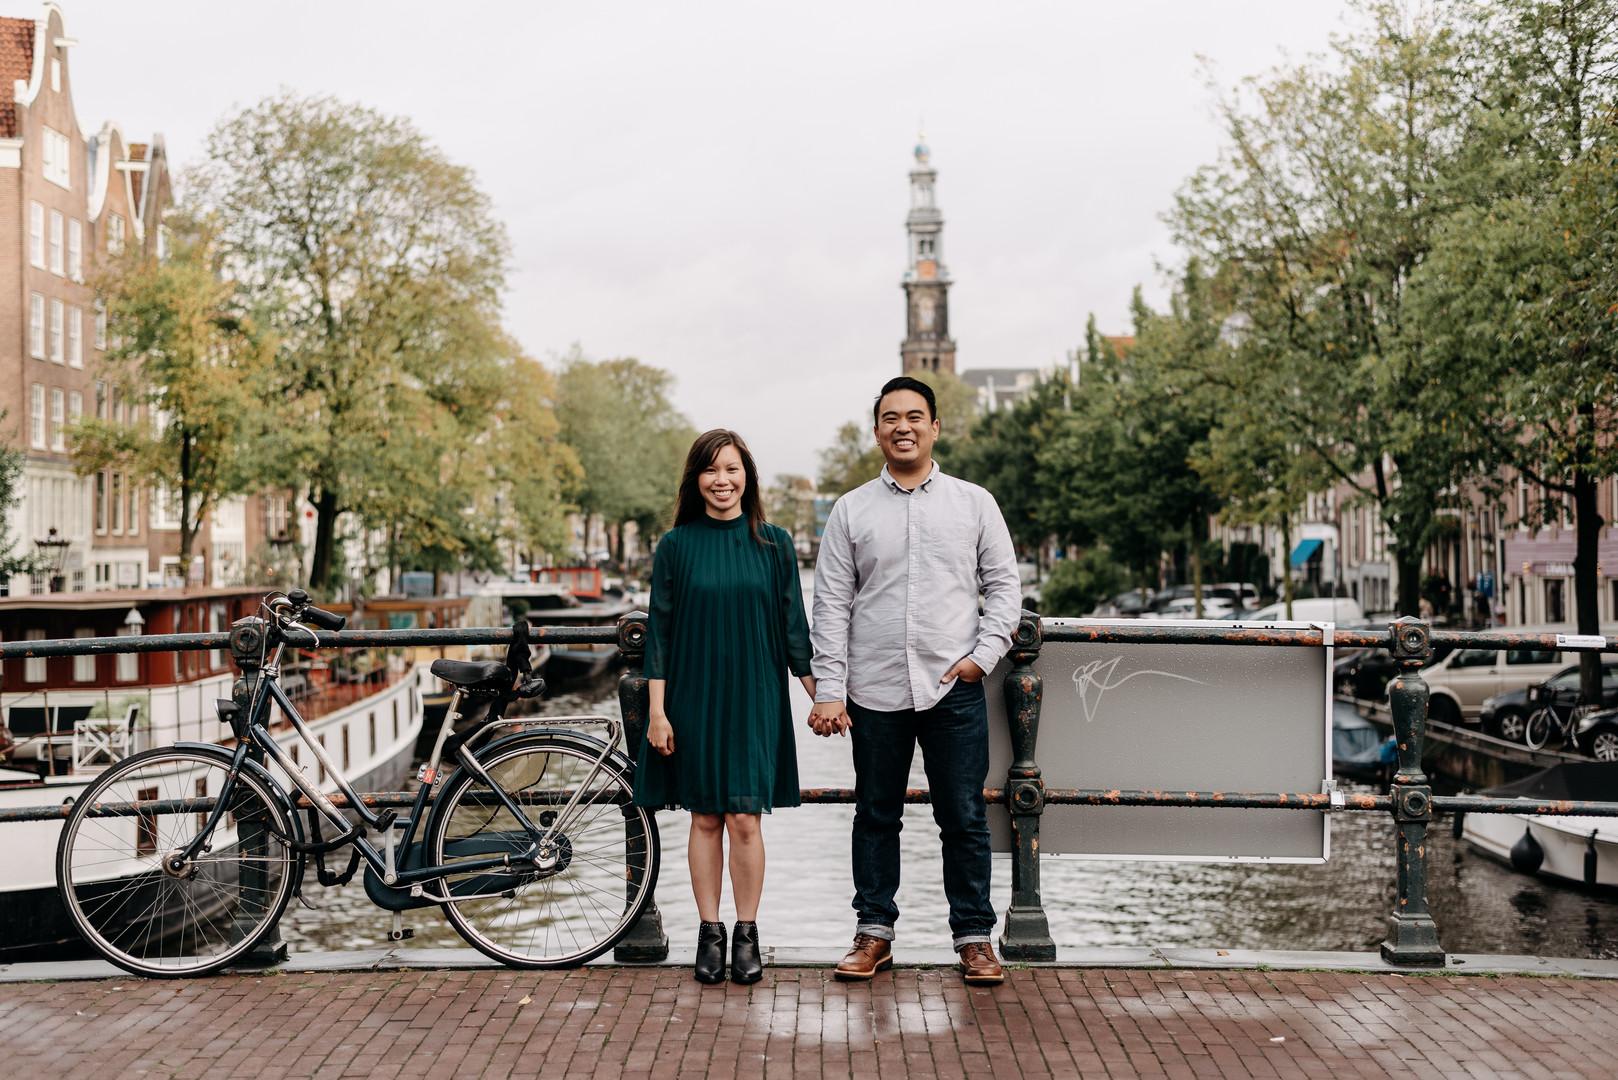 Couple photoshoot in Amsterdam   framedbyemily.com